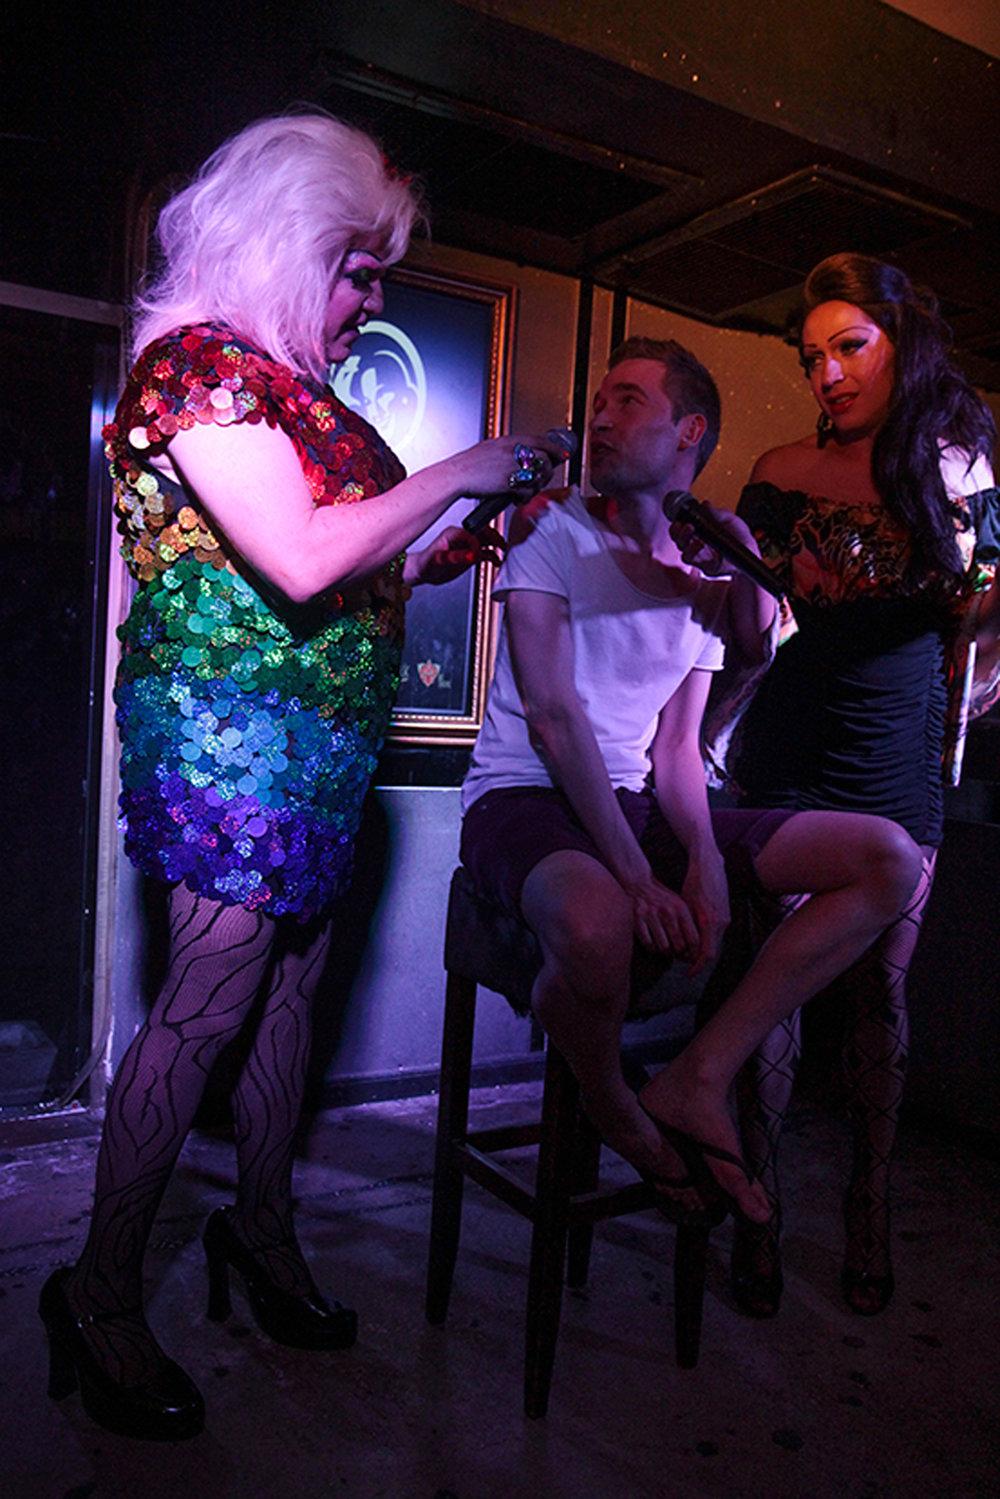 Evita Drag Night - Tel Aviv, Israel/Palestine